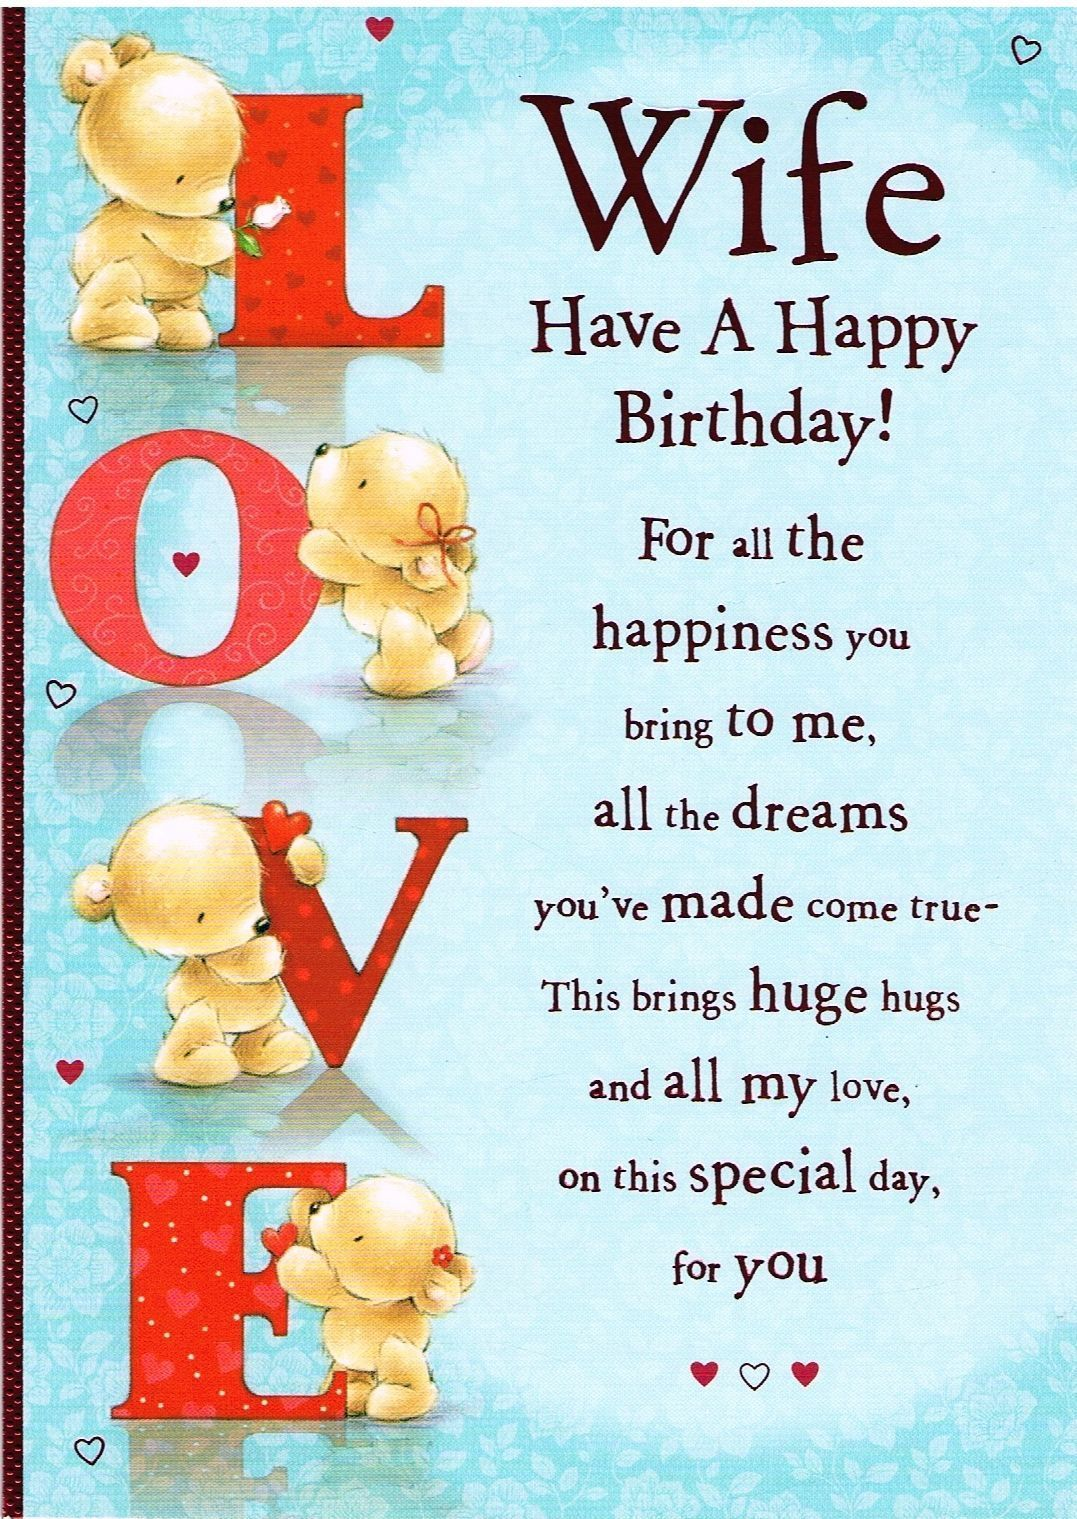 Wife Birthday Card Cute Card Loving Message Jpg 1077 1519